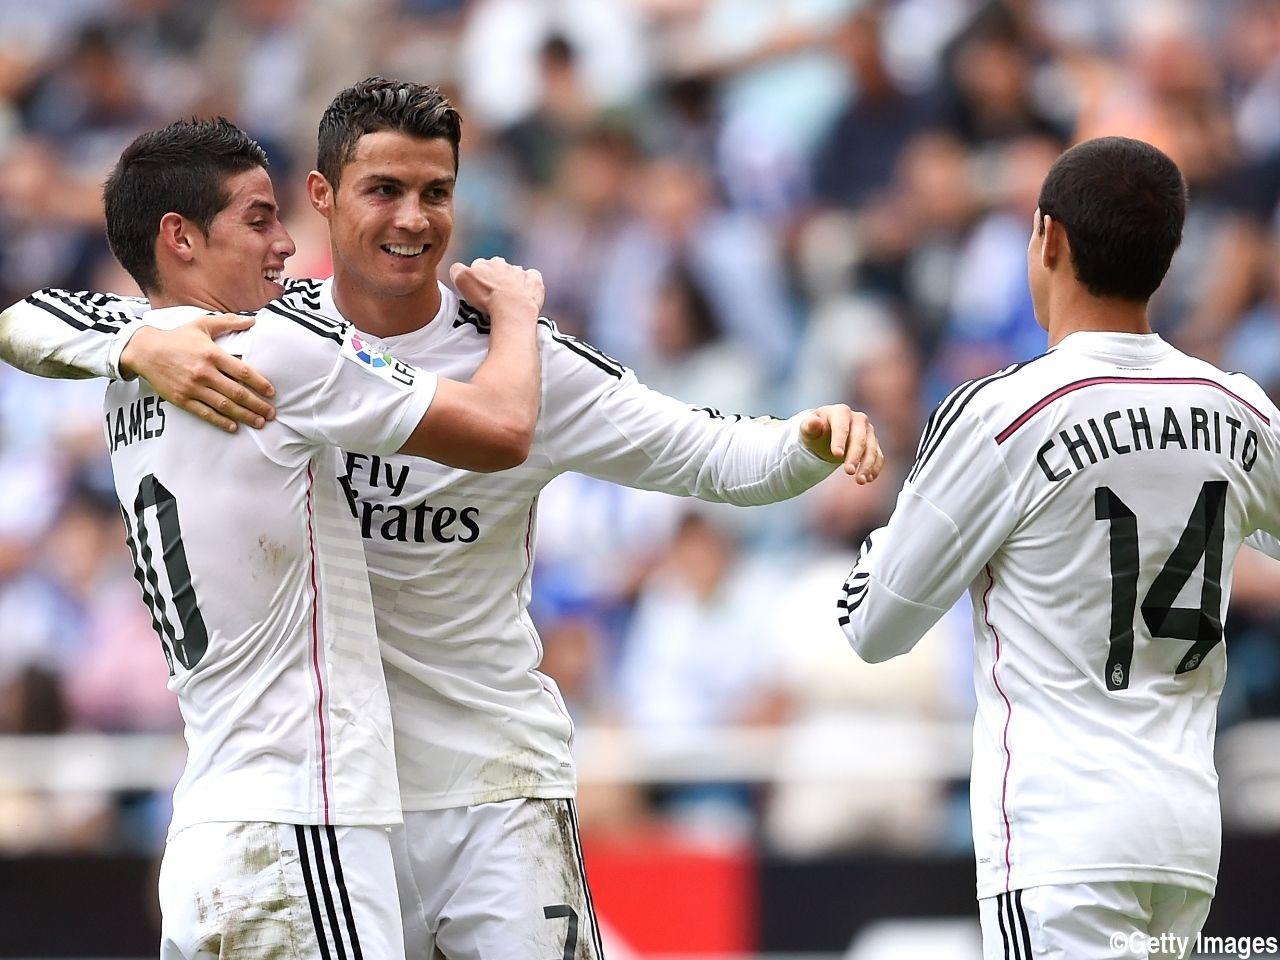 Real Madrid C.F. Cristiano Ronaldo, Chicharito, James